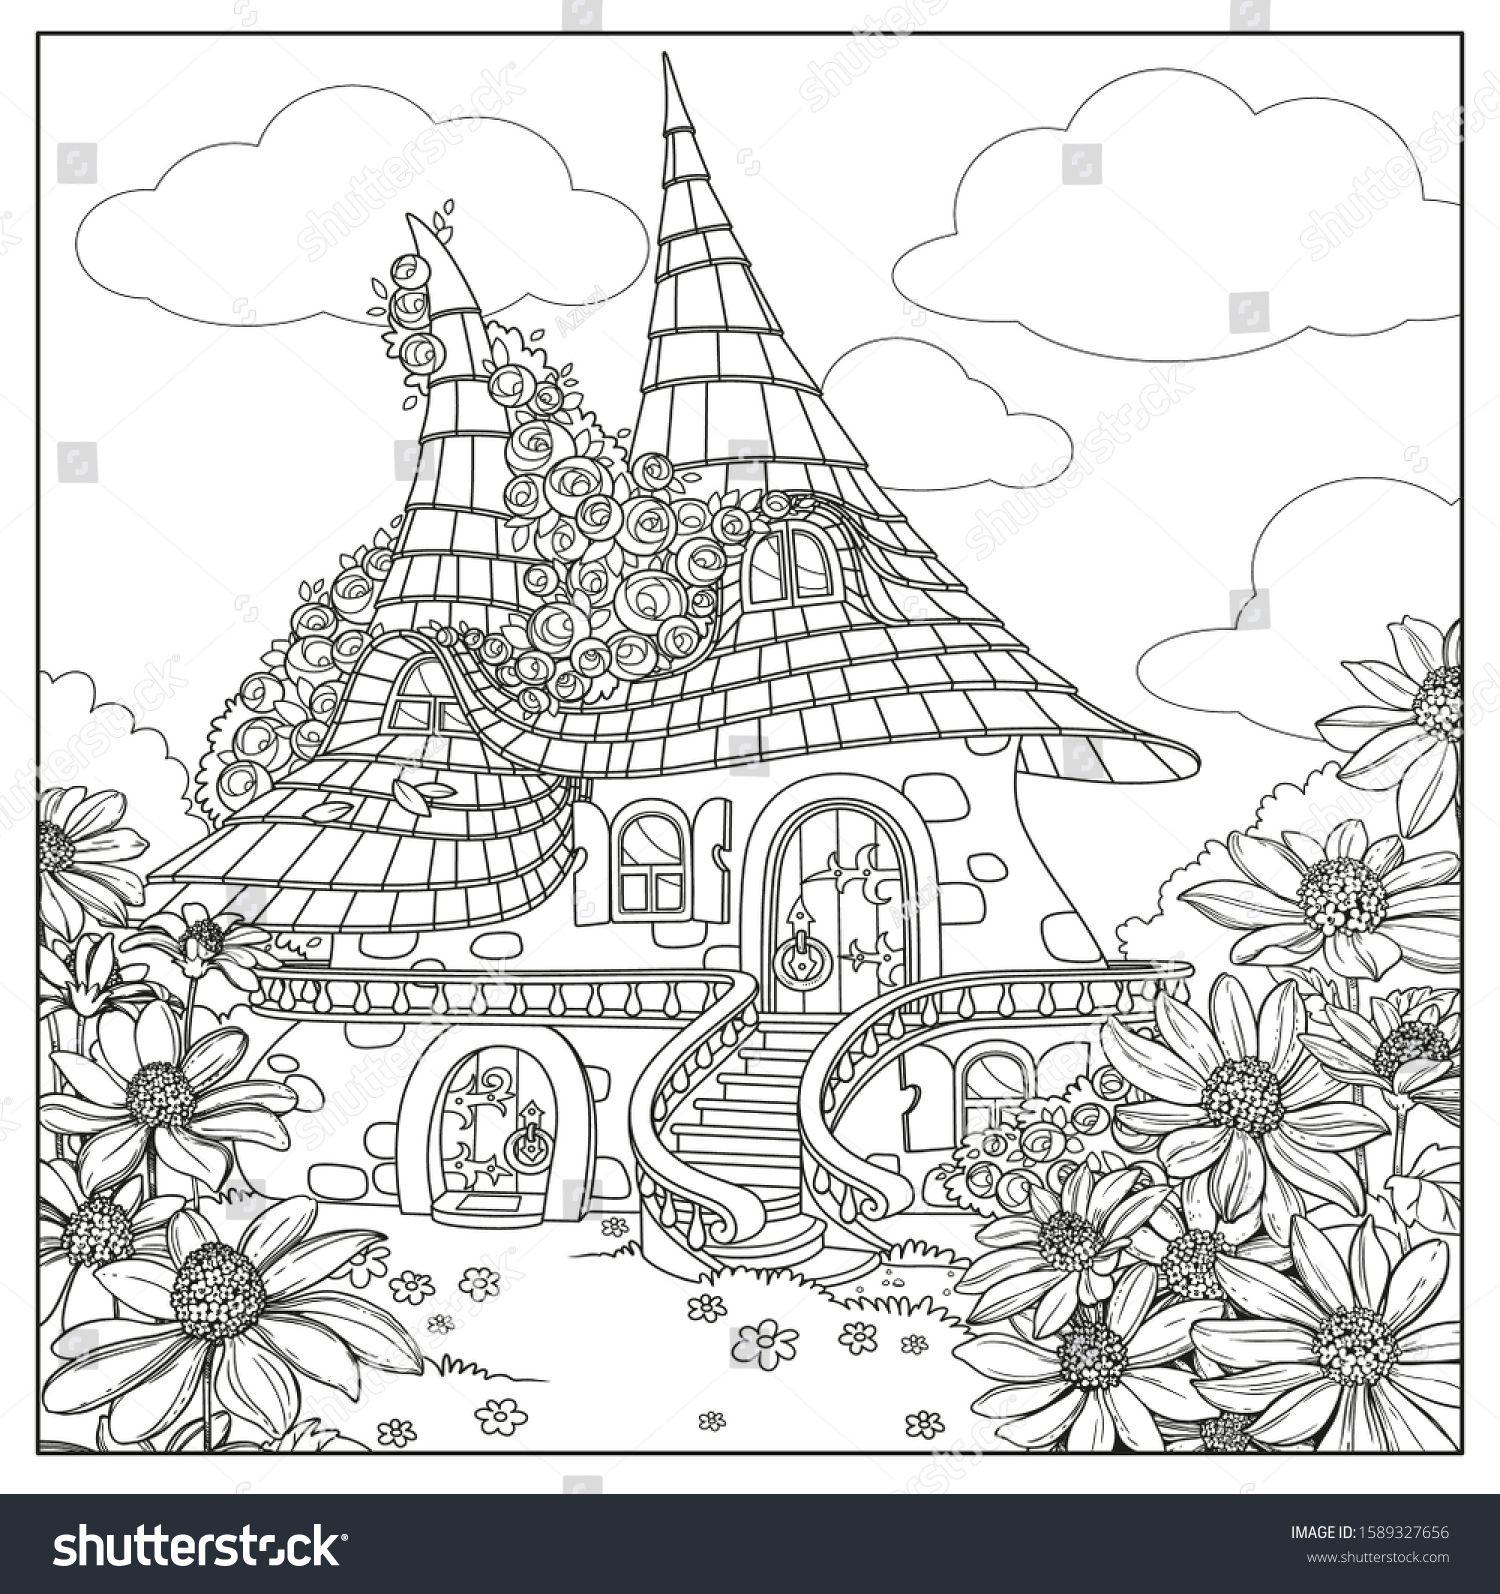 Summer Fairy Tale Big Home Two เวกเตอร สต อก ปลอดค าล ขส ทธ 1589327656 ภาพประกอบ